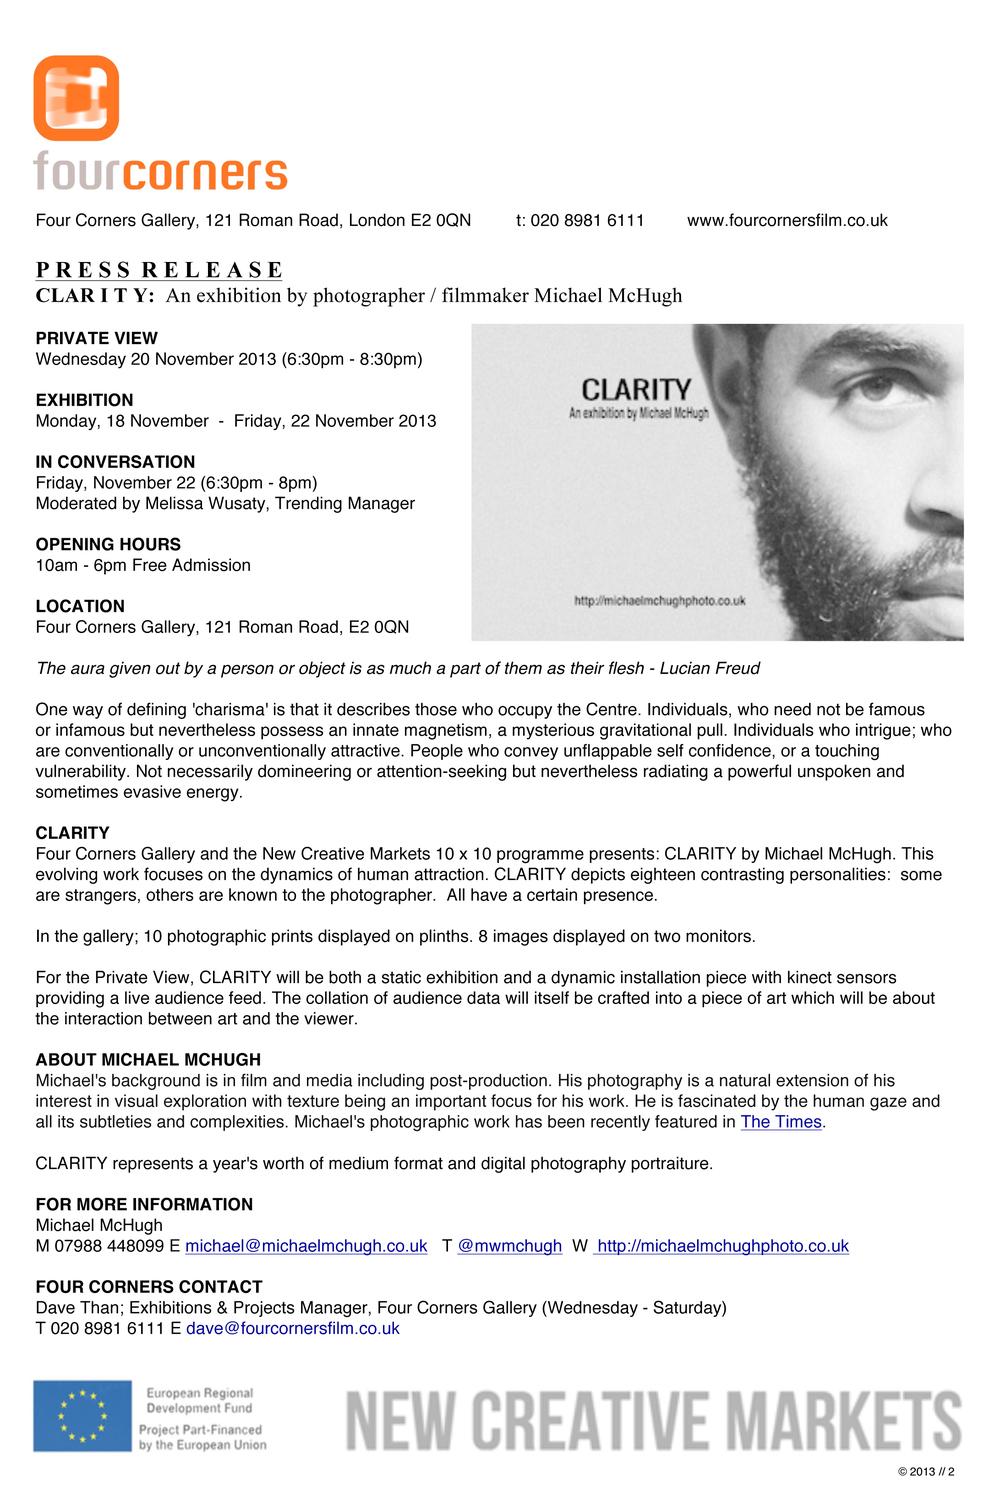 FINAL DAVE press release 01-11-13.jpg